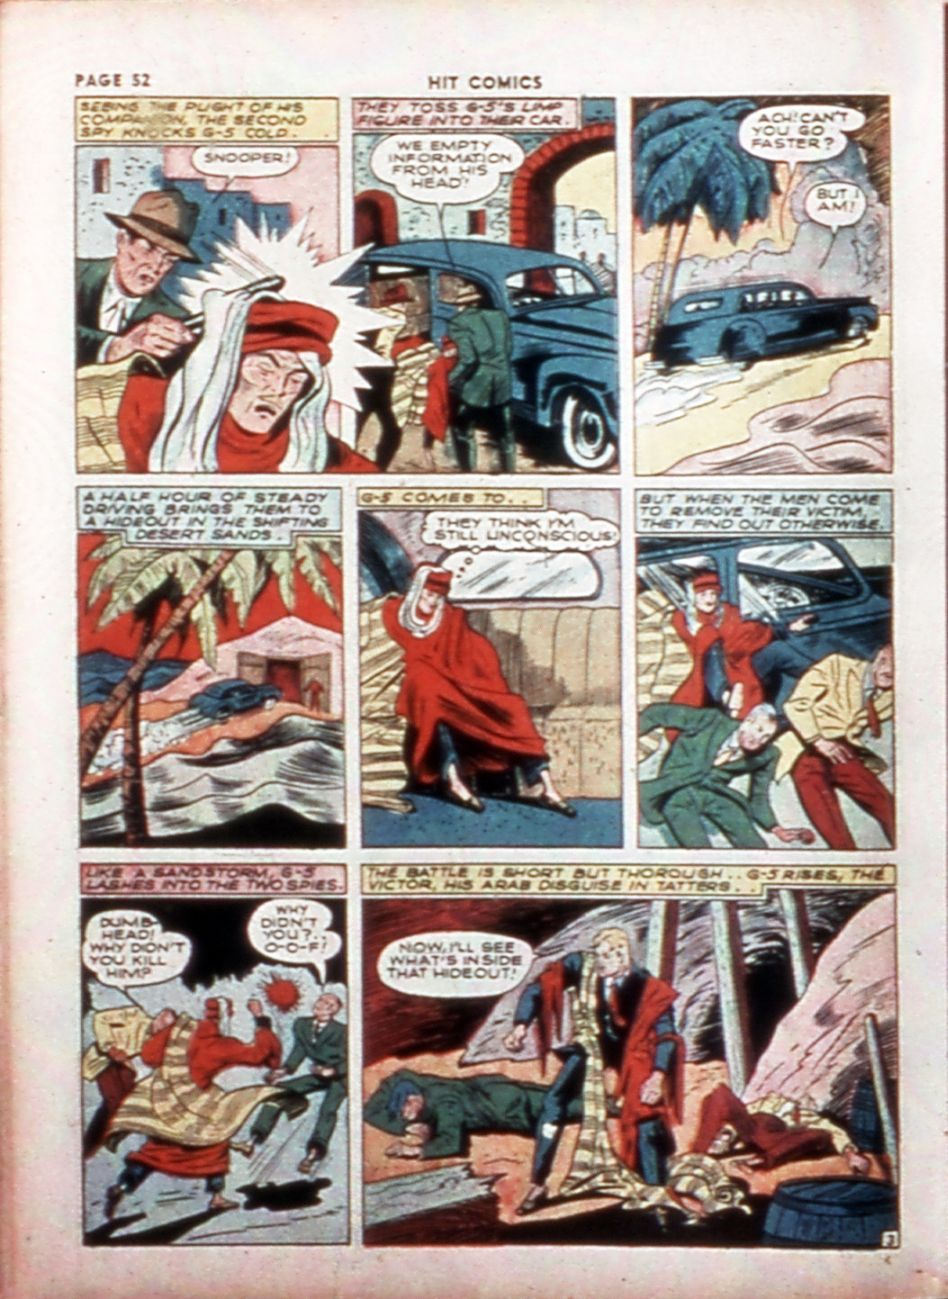 Read online Hit Comics comic -  Issue #14 - 54